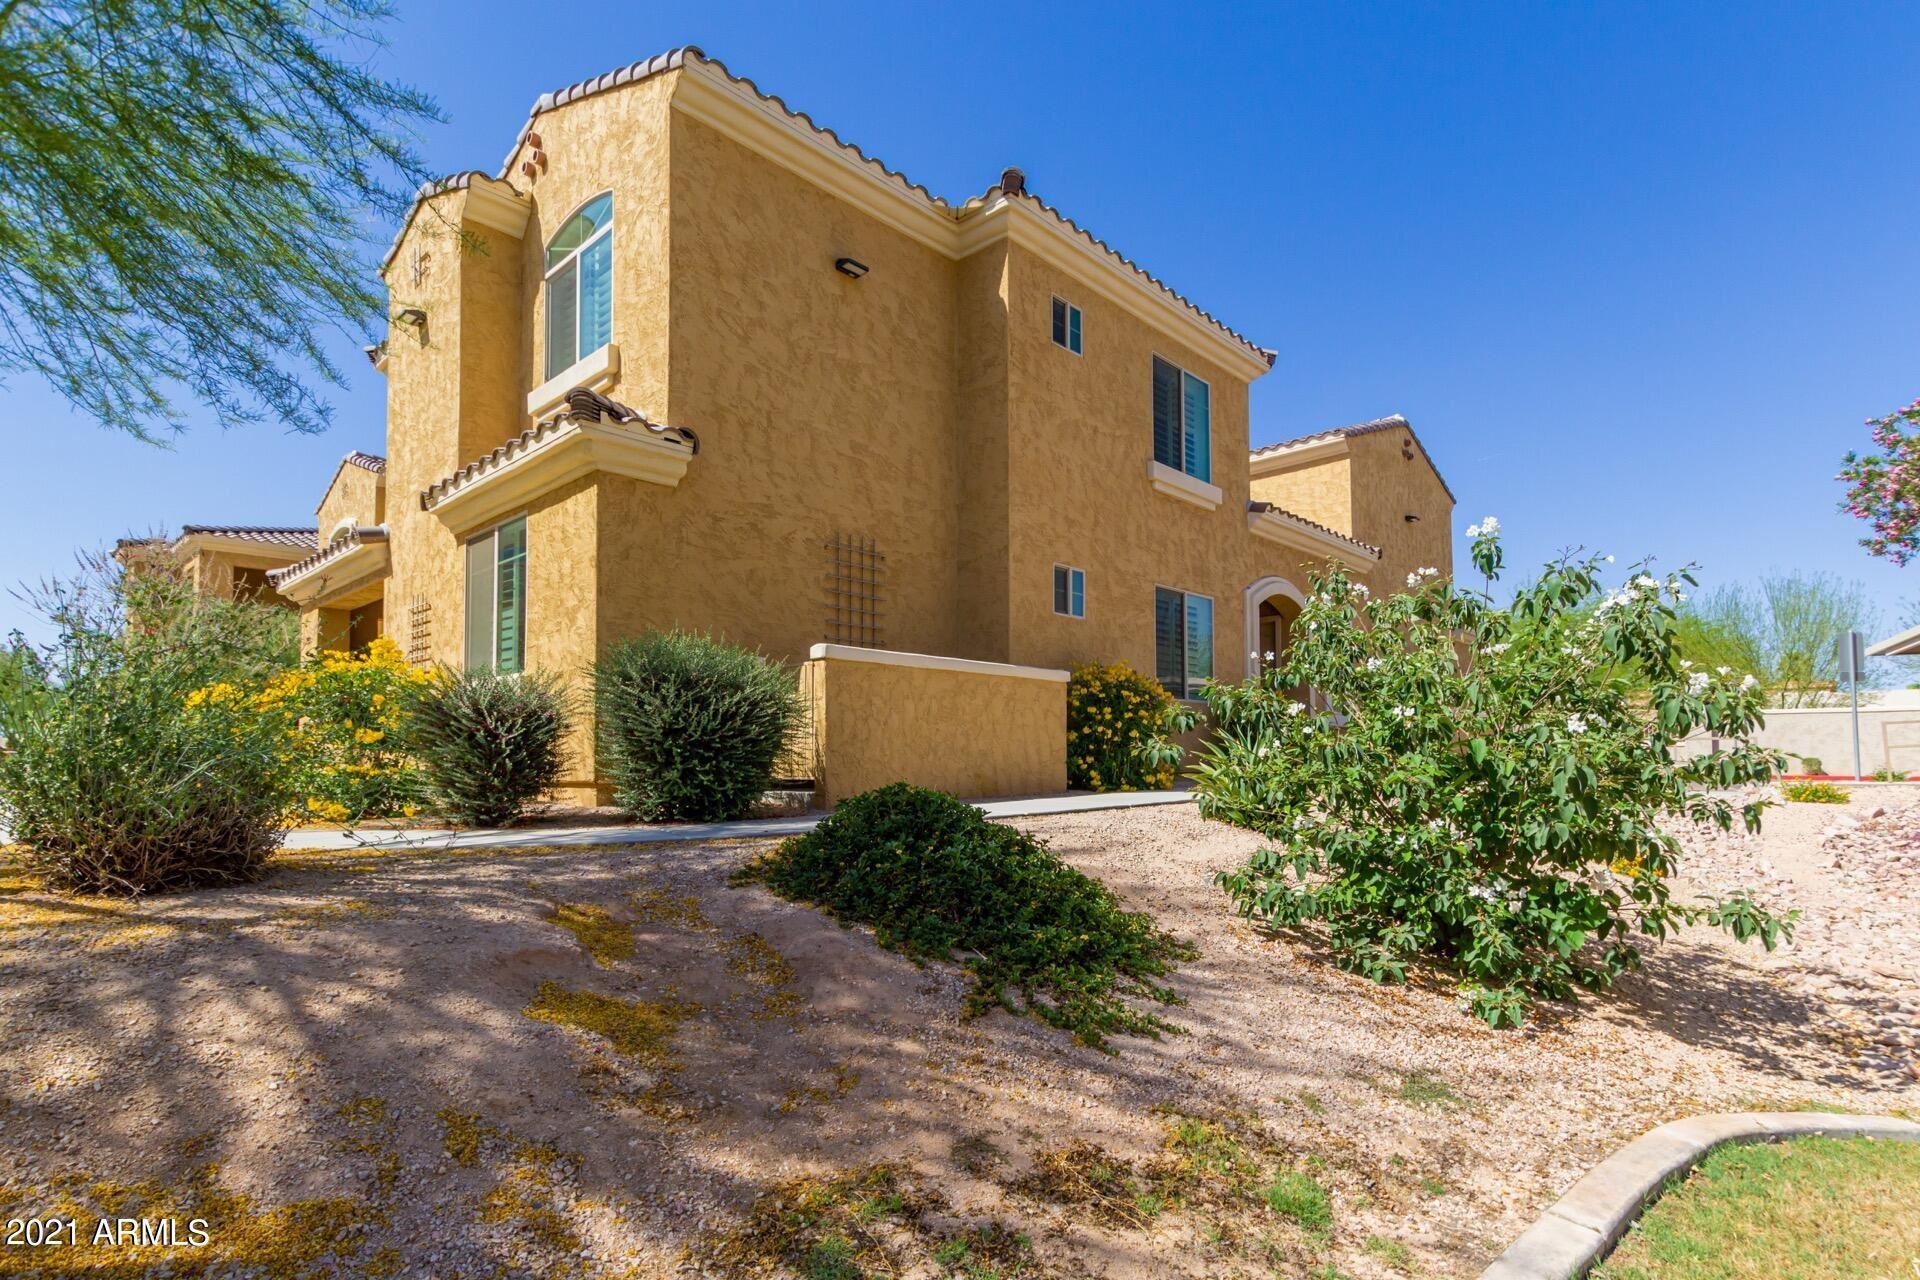 900 S CANAL Drive #210, Chandler, AZ 85225 - MLS#: 6236276